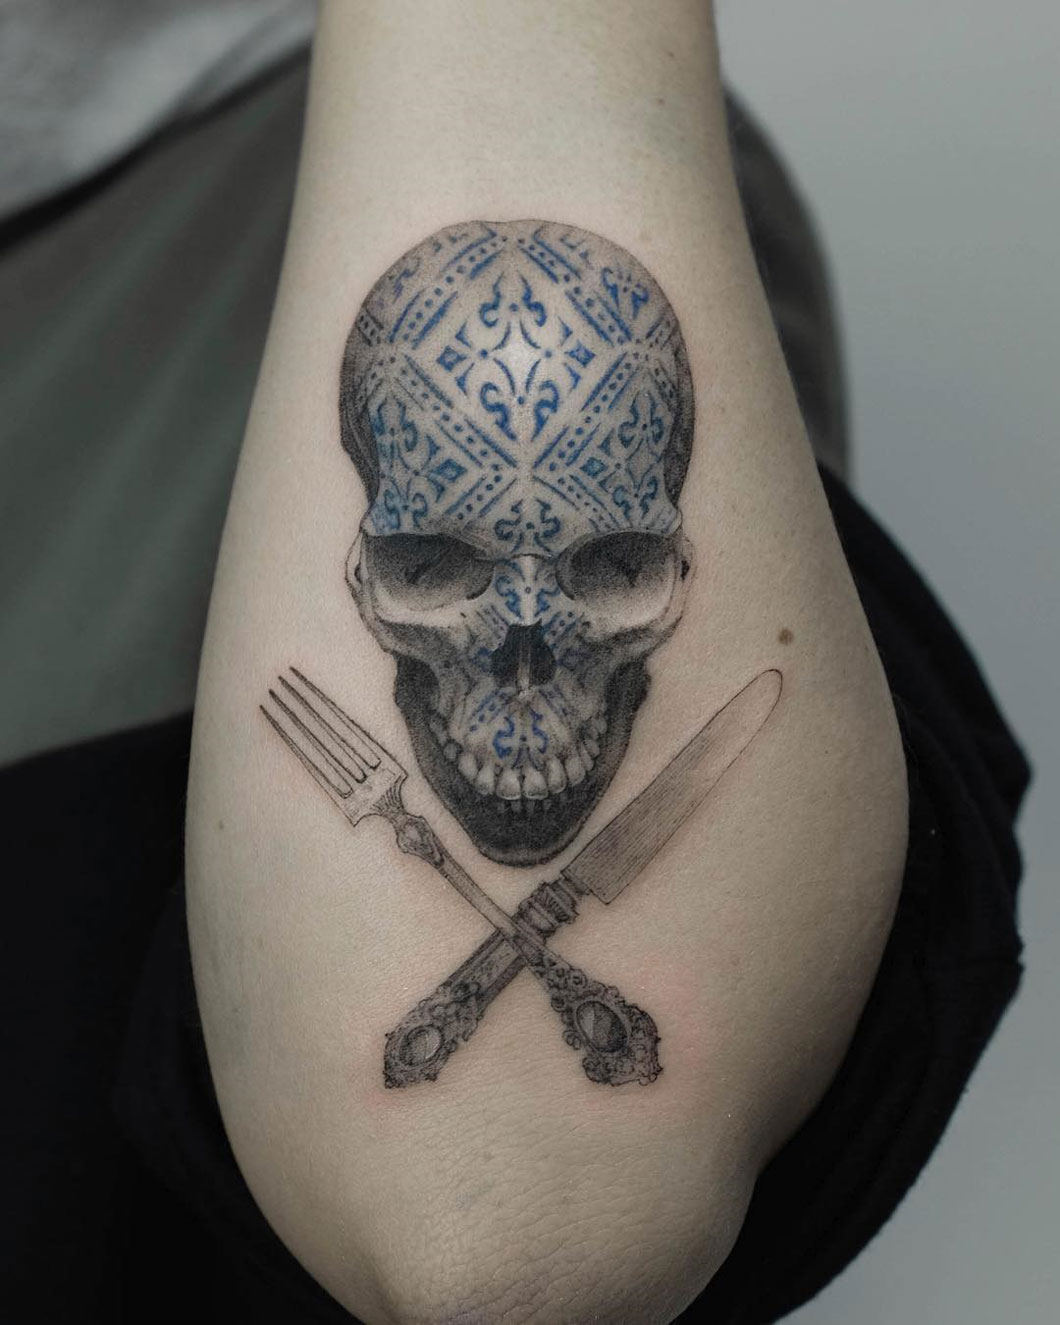 Chef's Skull